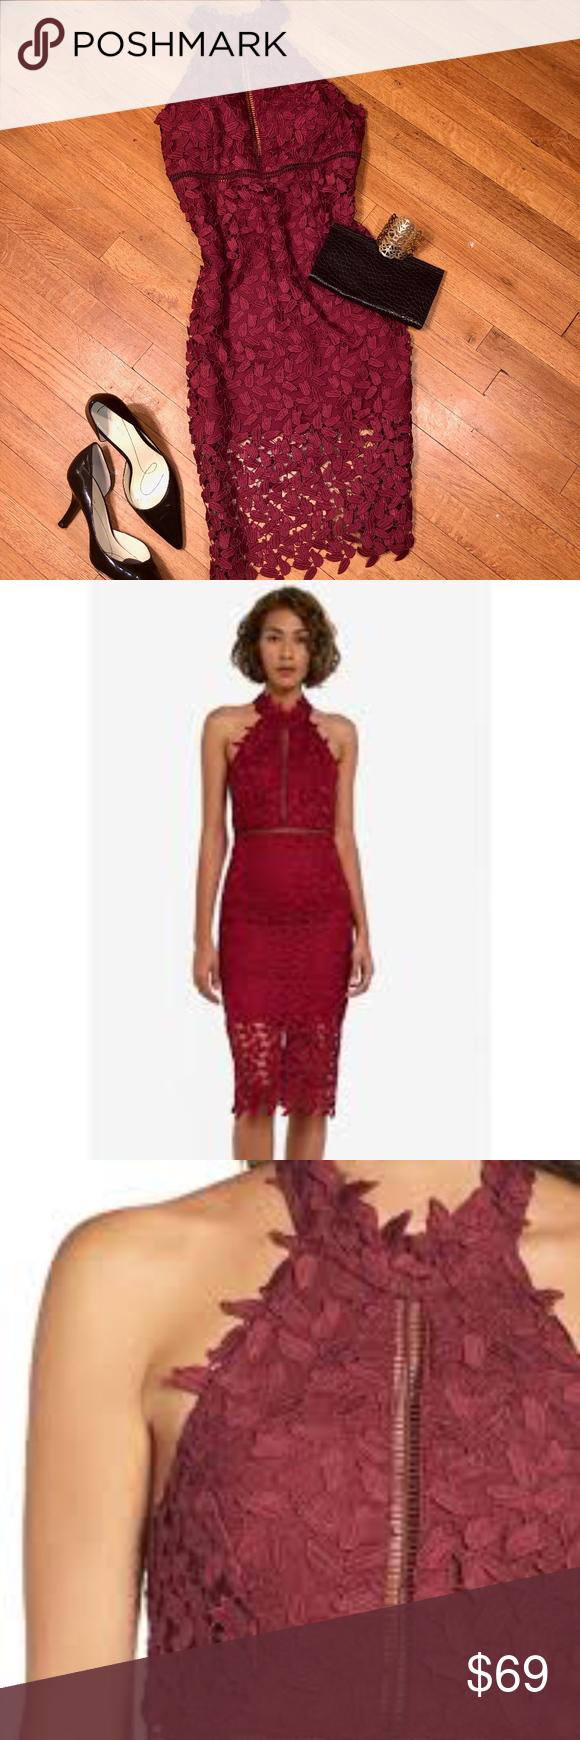 Nwt Bardot Burgundy Gemma Halter Lace Sheath Dress Brand New